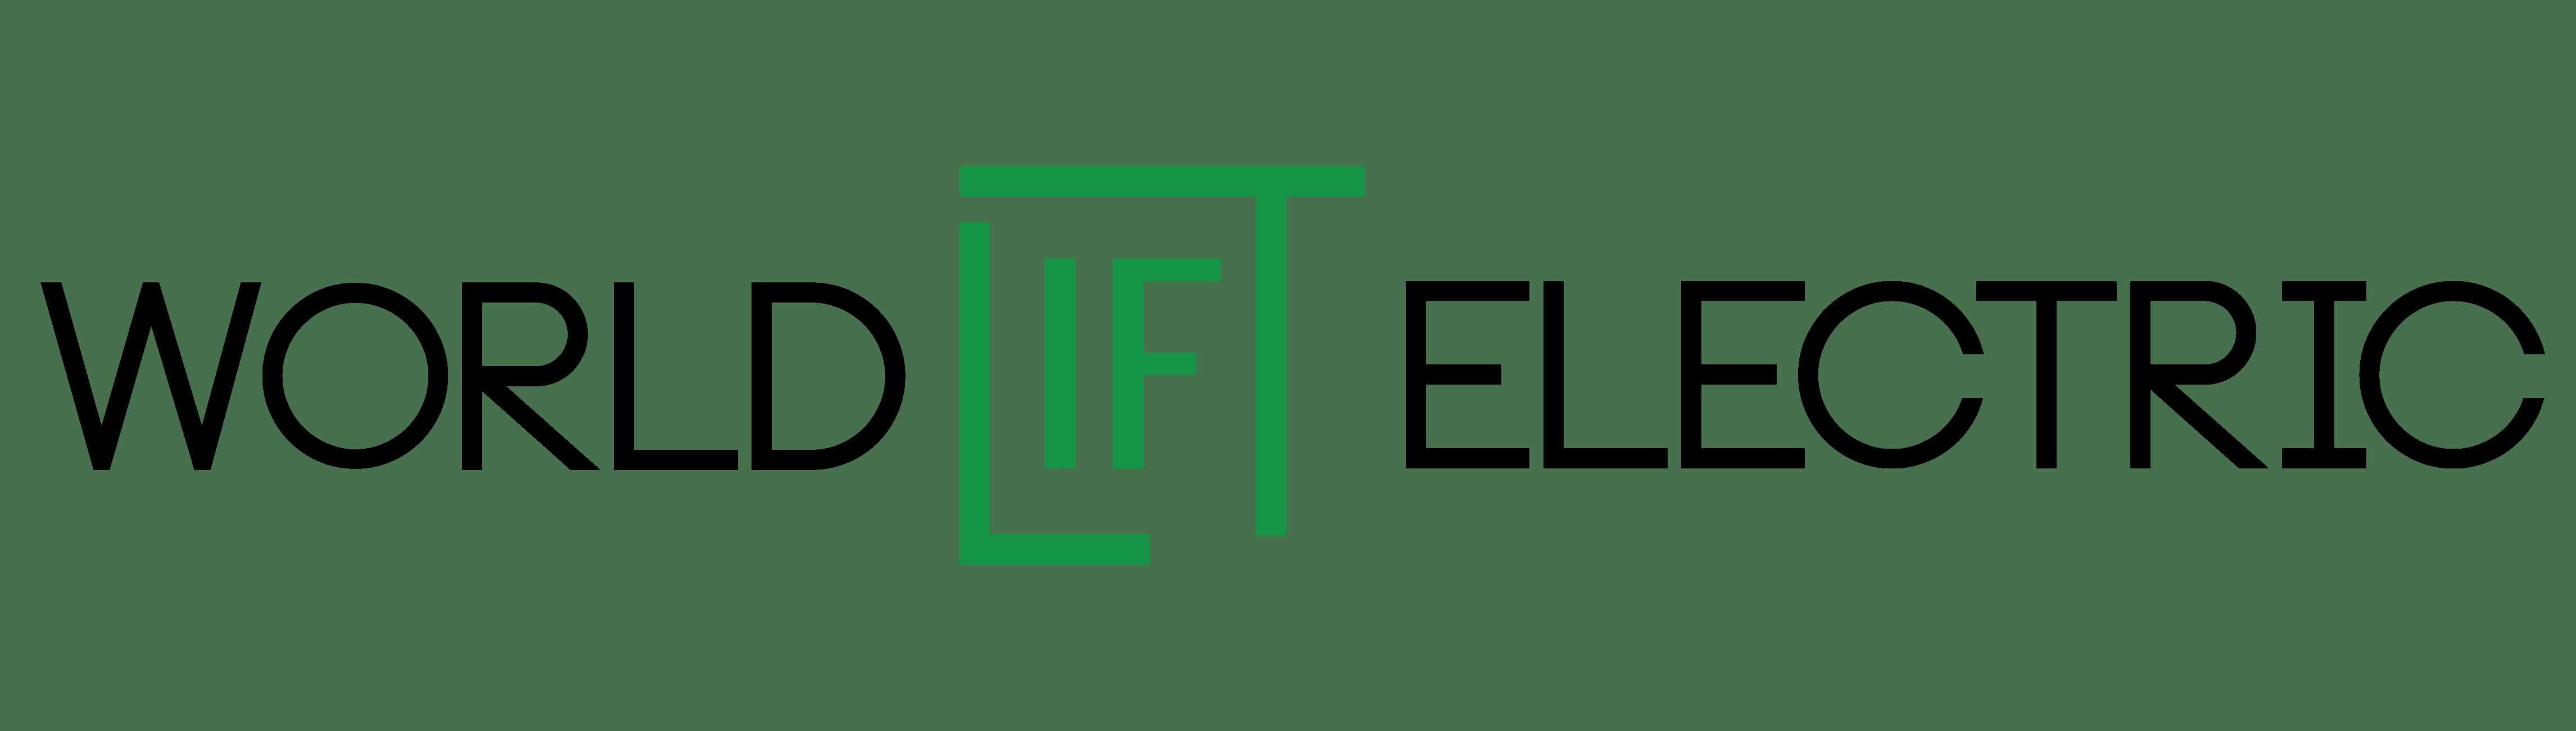 World Lift Electric s.r.l.